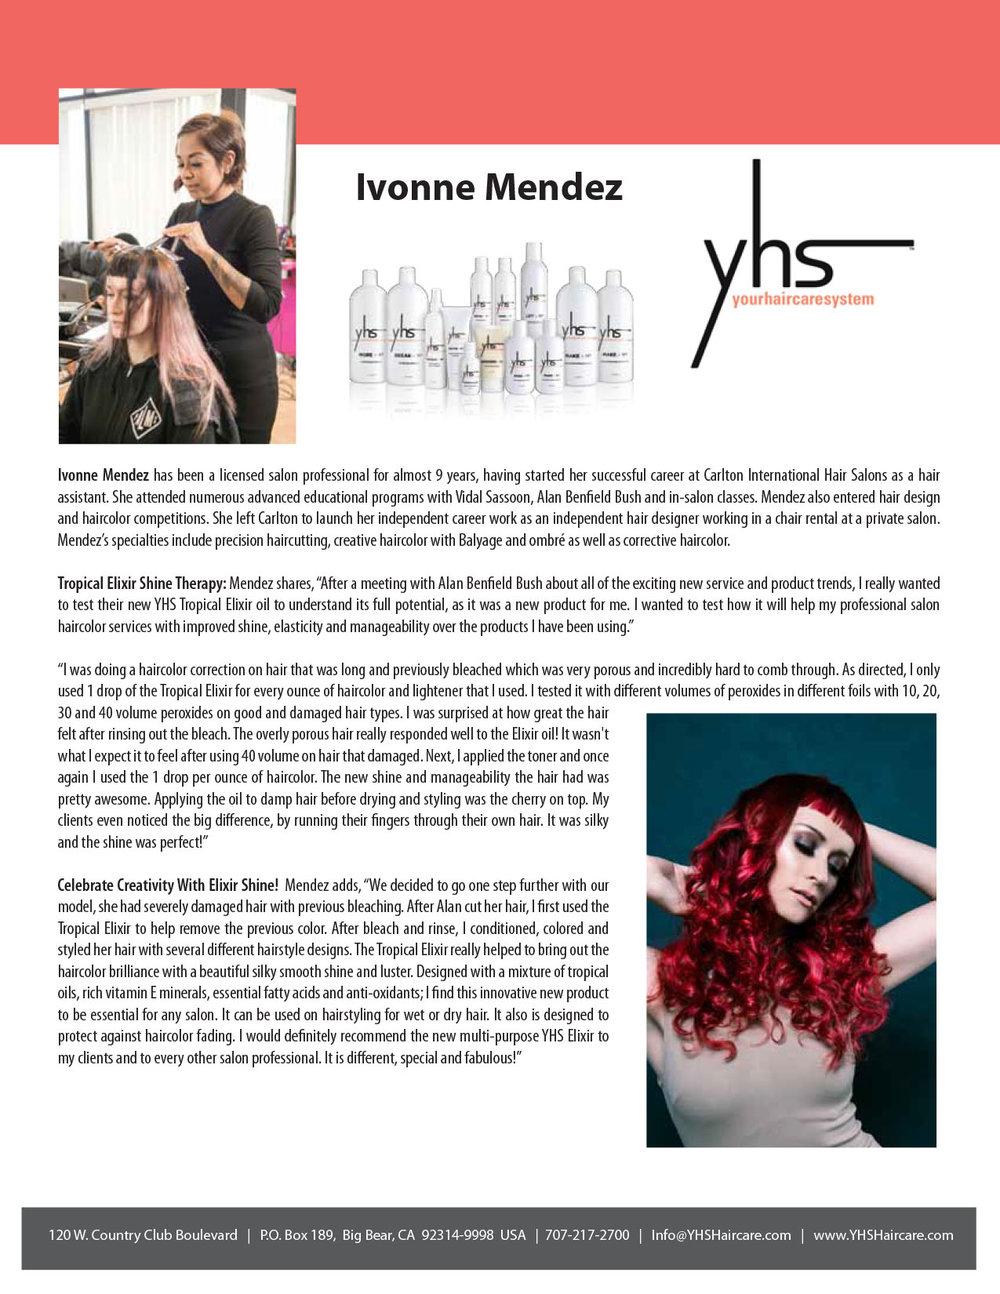 Ivonne Mendez Testimonial – YHS Haircare